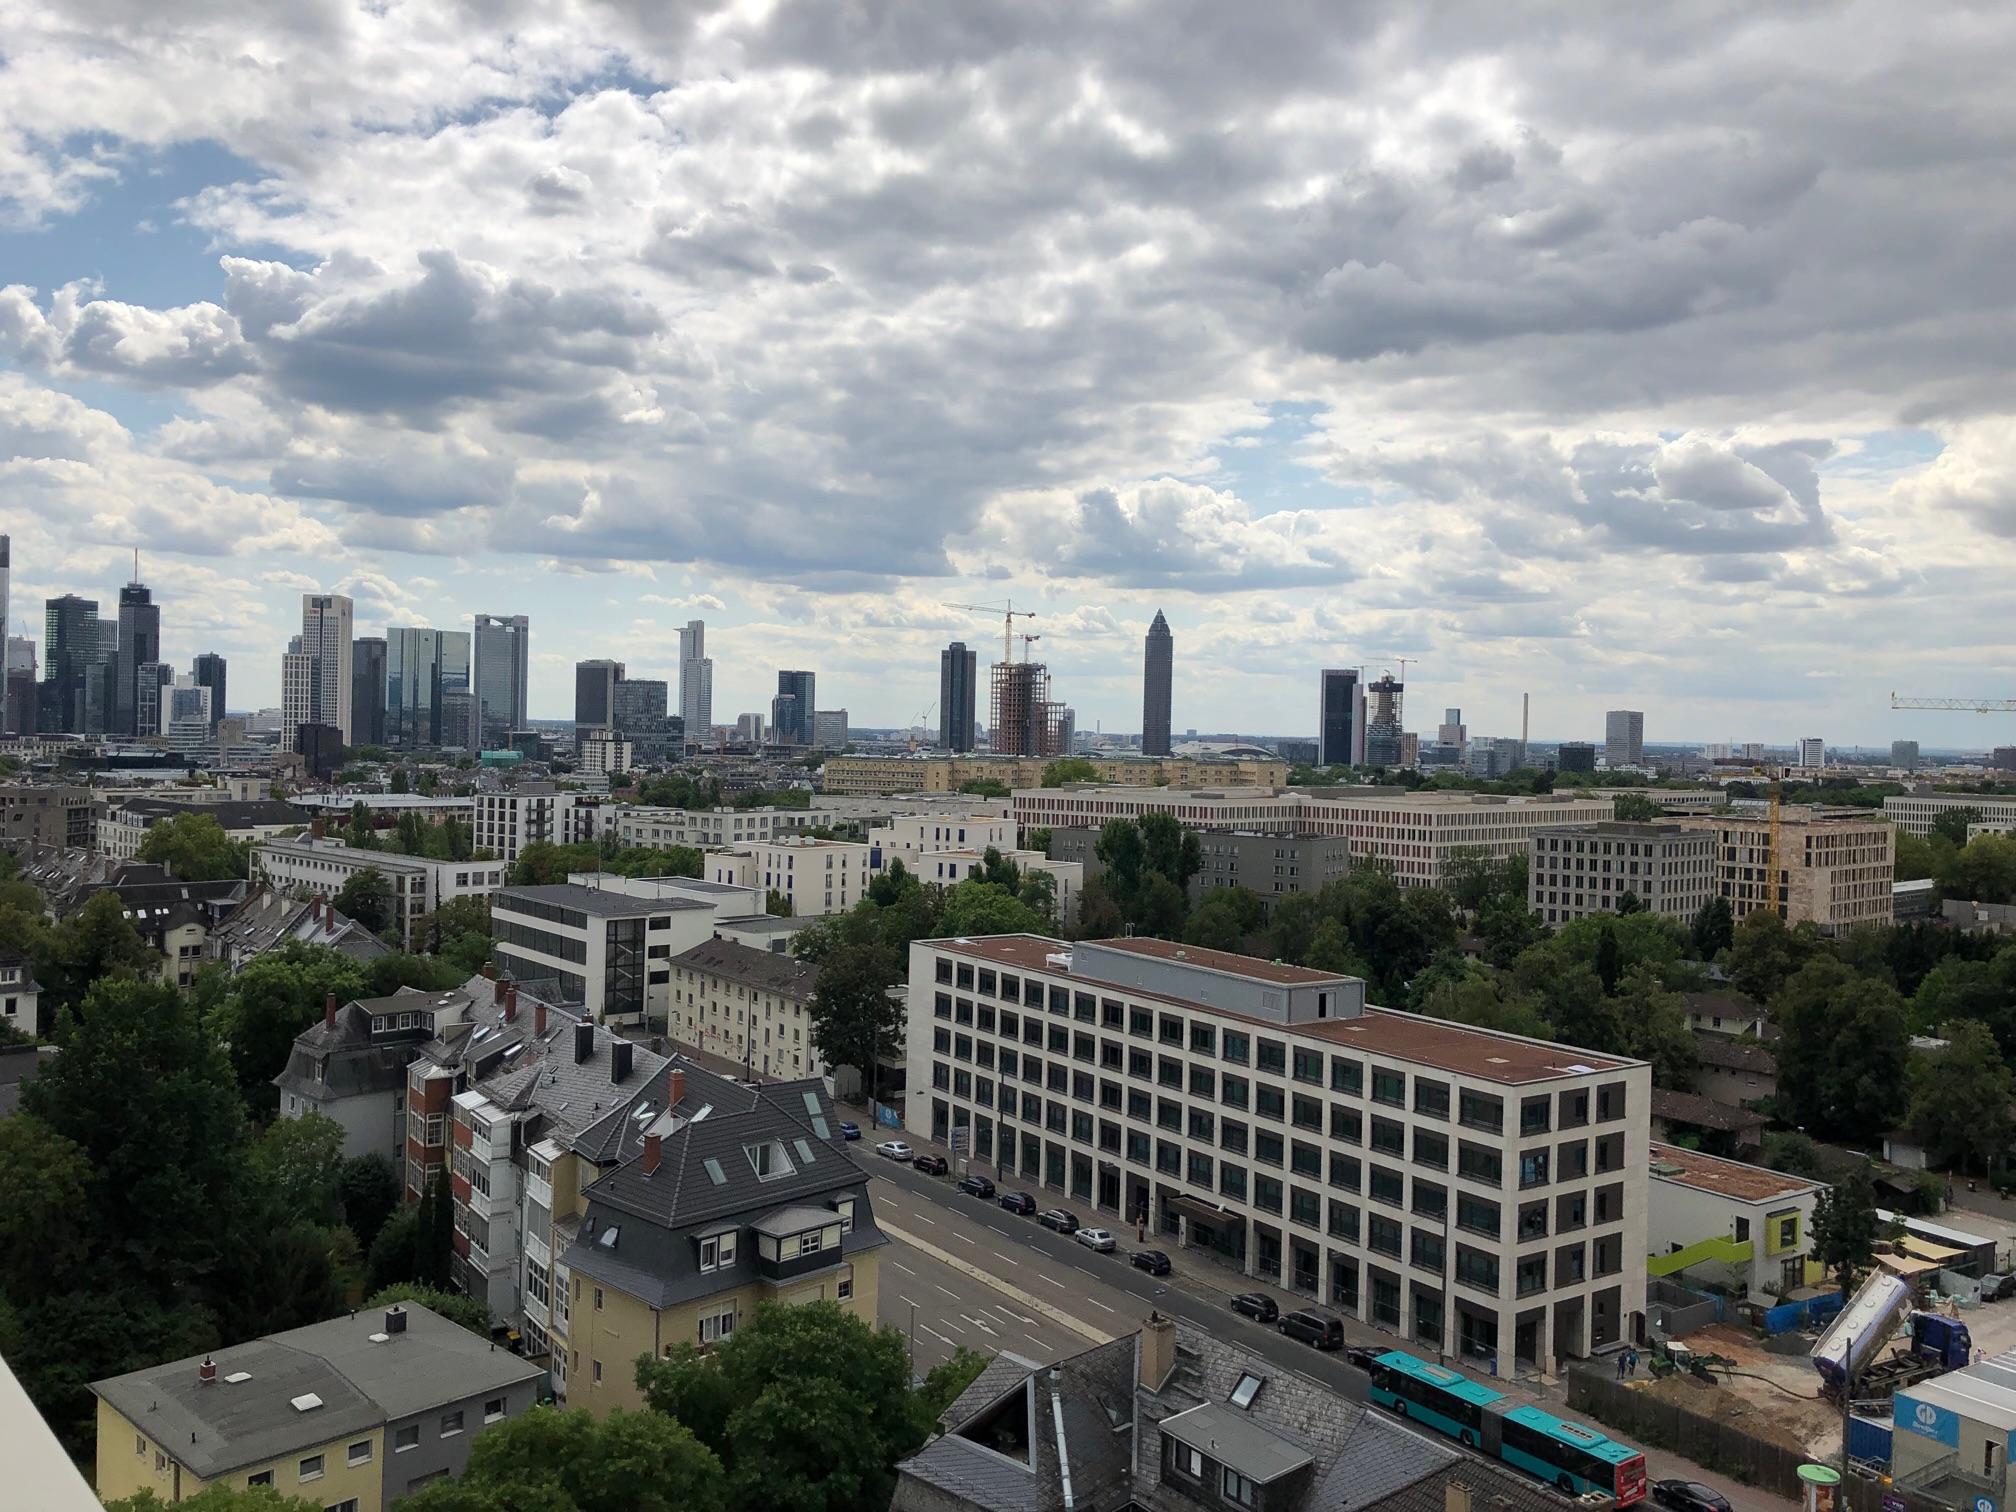 © Stadt Frankfurt am Main, Foto: Katharina Stier